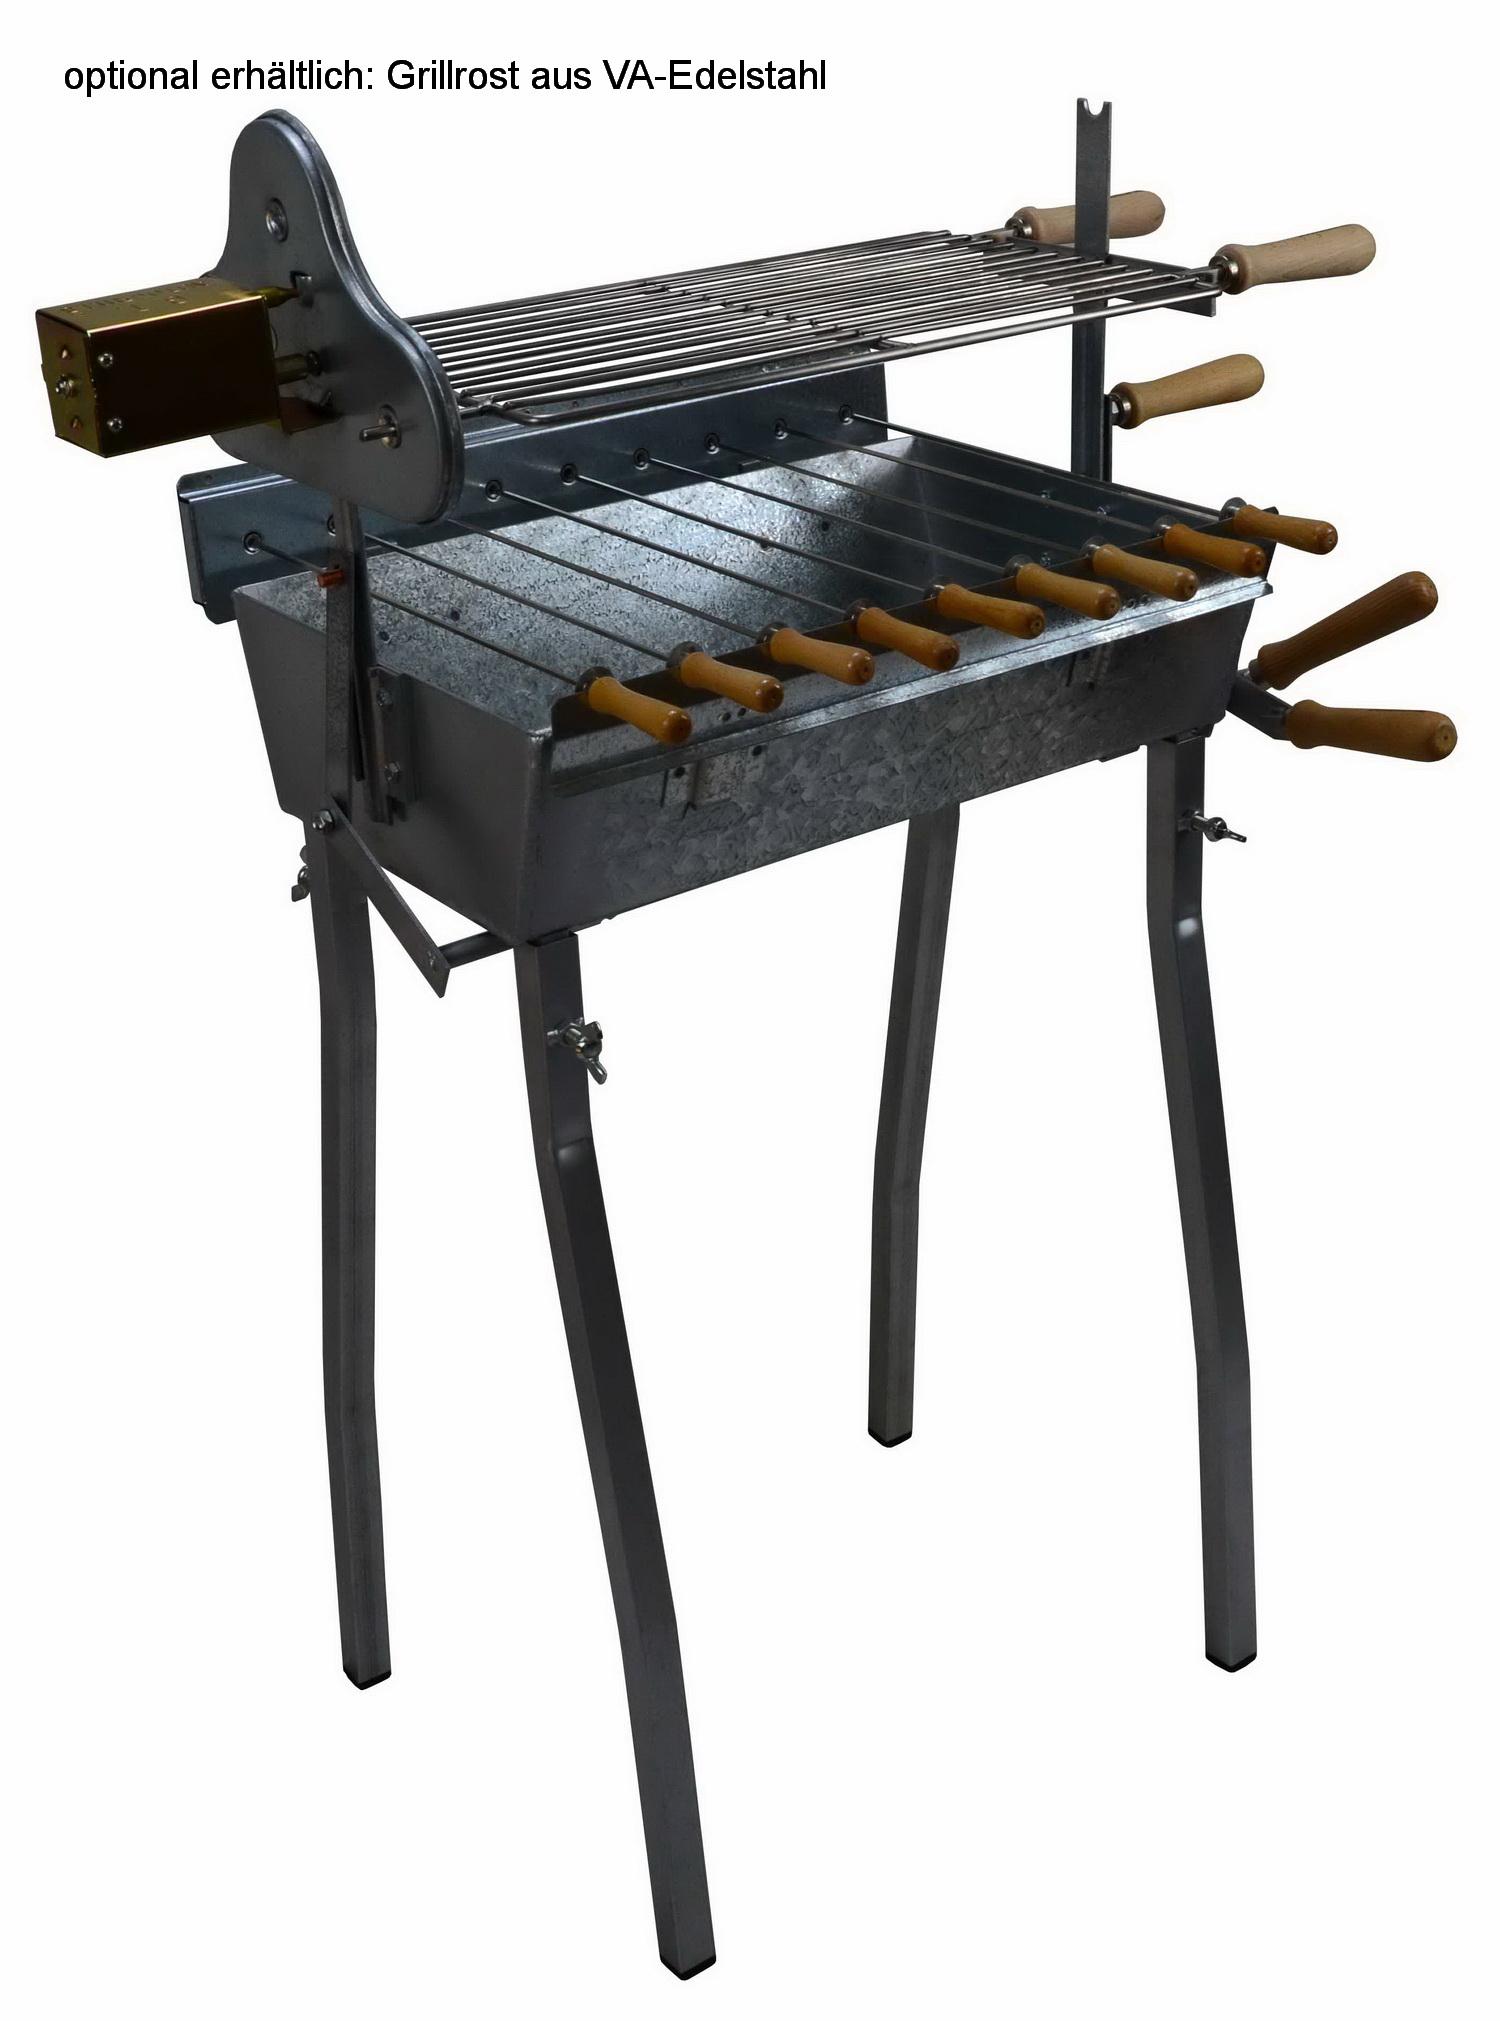 holzkohlegrill spie grill 50 mit rost online kaufen spiess holzkohlegrills. Black Bedroom Furniture Sets. Home Design Ideas